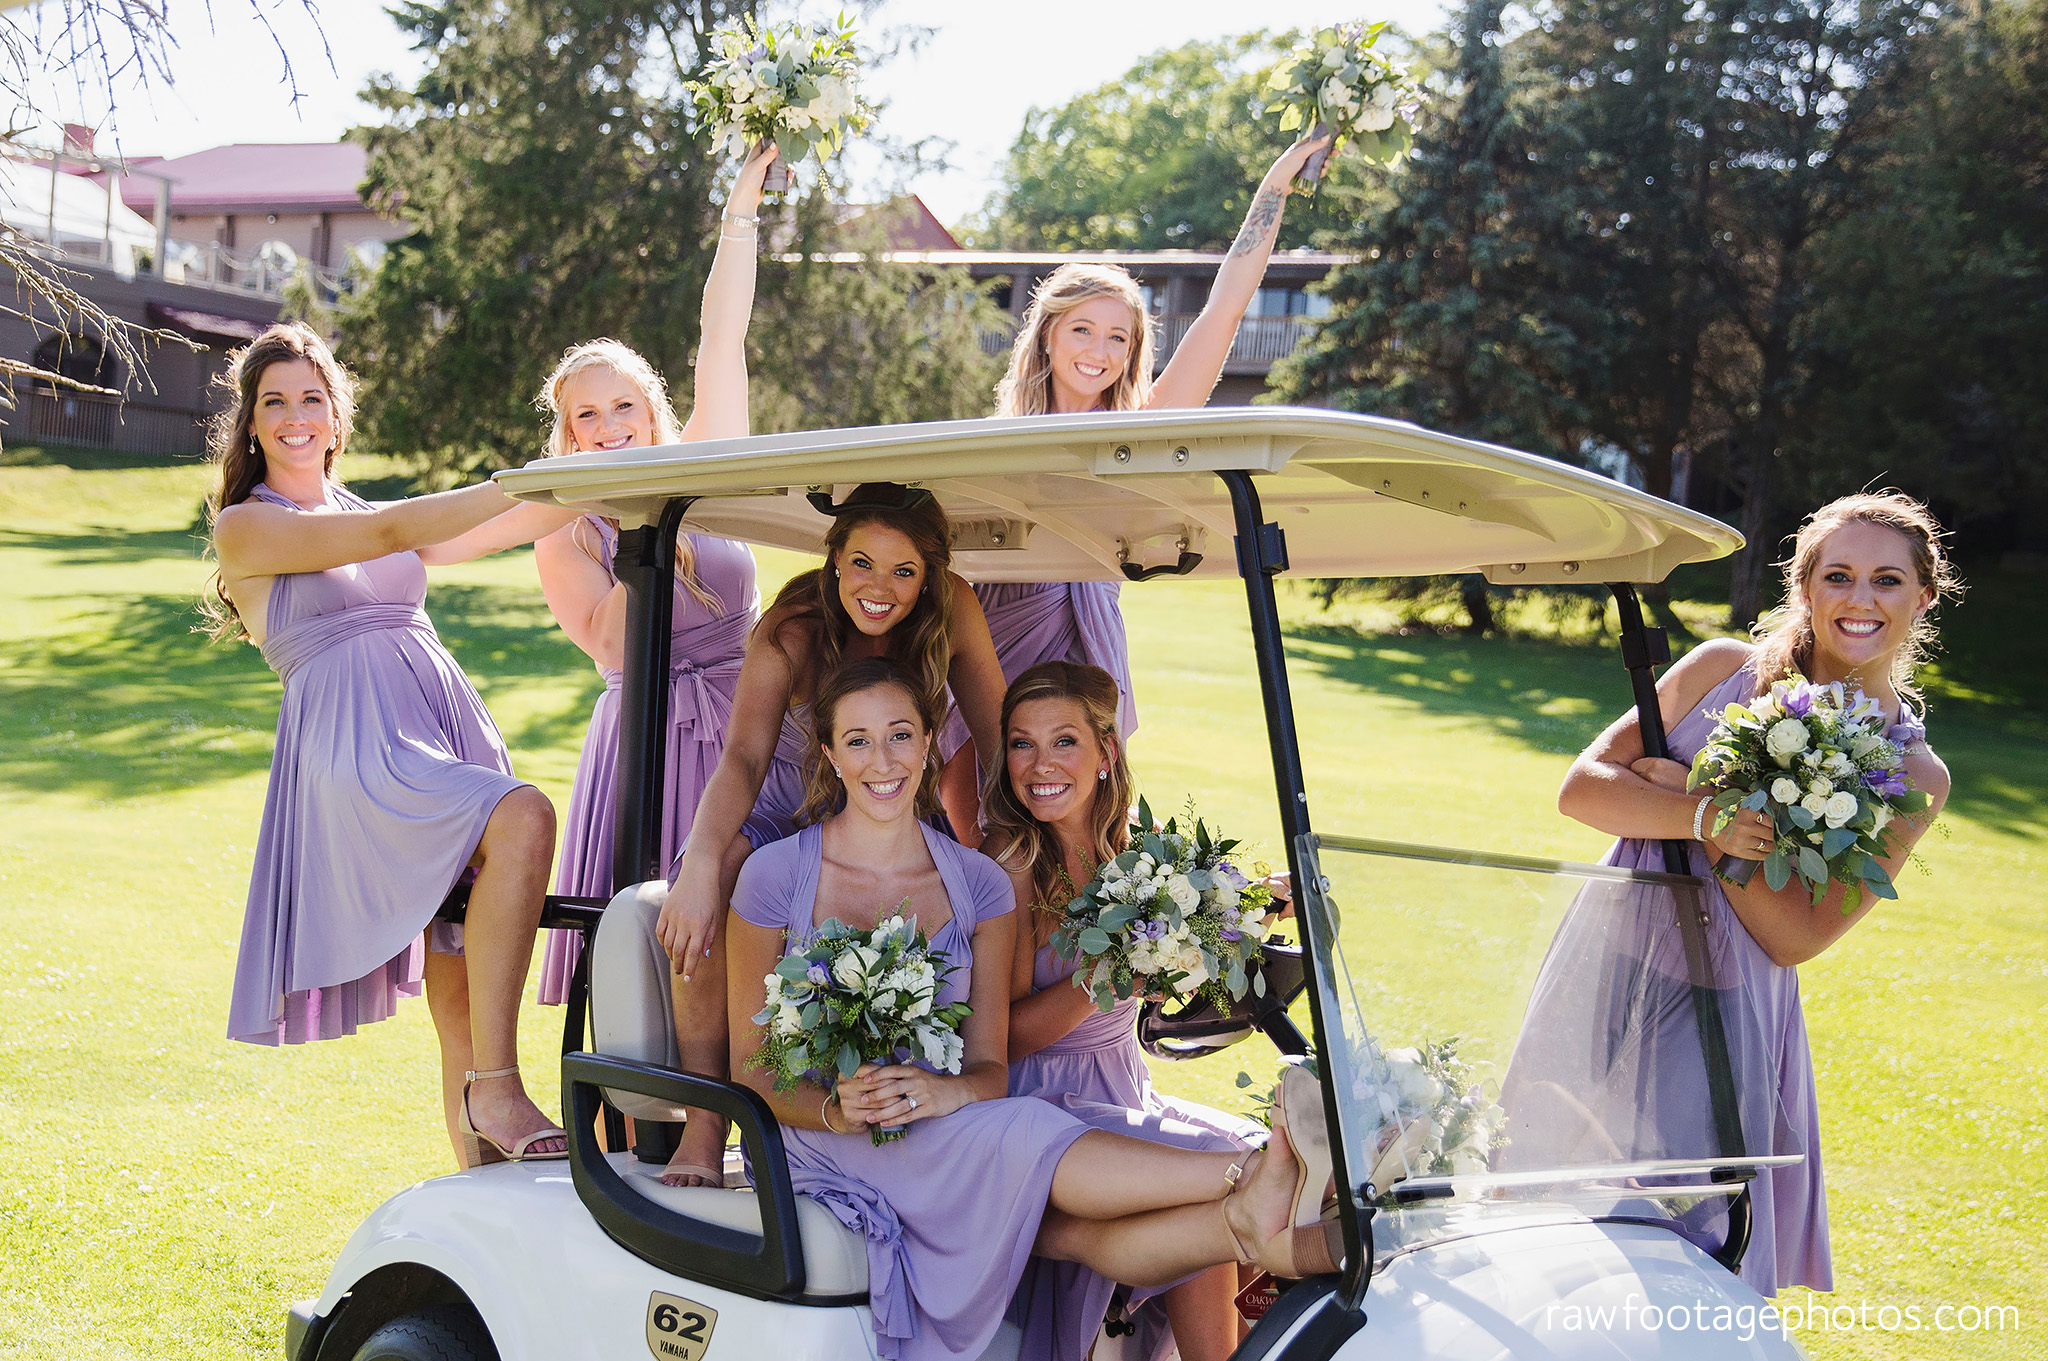 london_ontario_wedding_photographer-grand_bend_wedding_photographer-oakwood_resort_wedding-beach_wedding-sunset_wedding-raw_footage_photography039.jpg